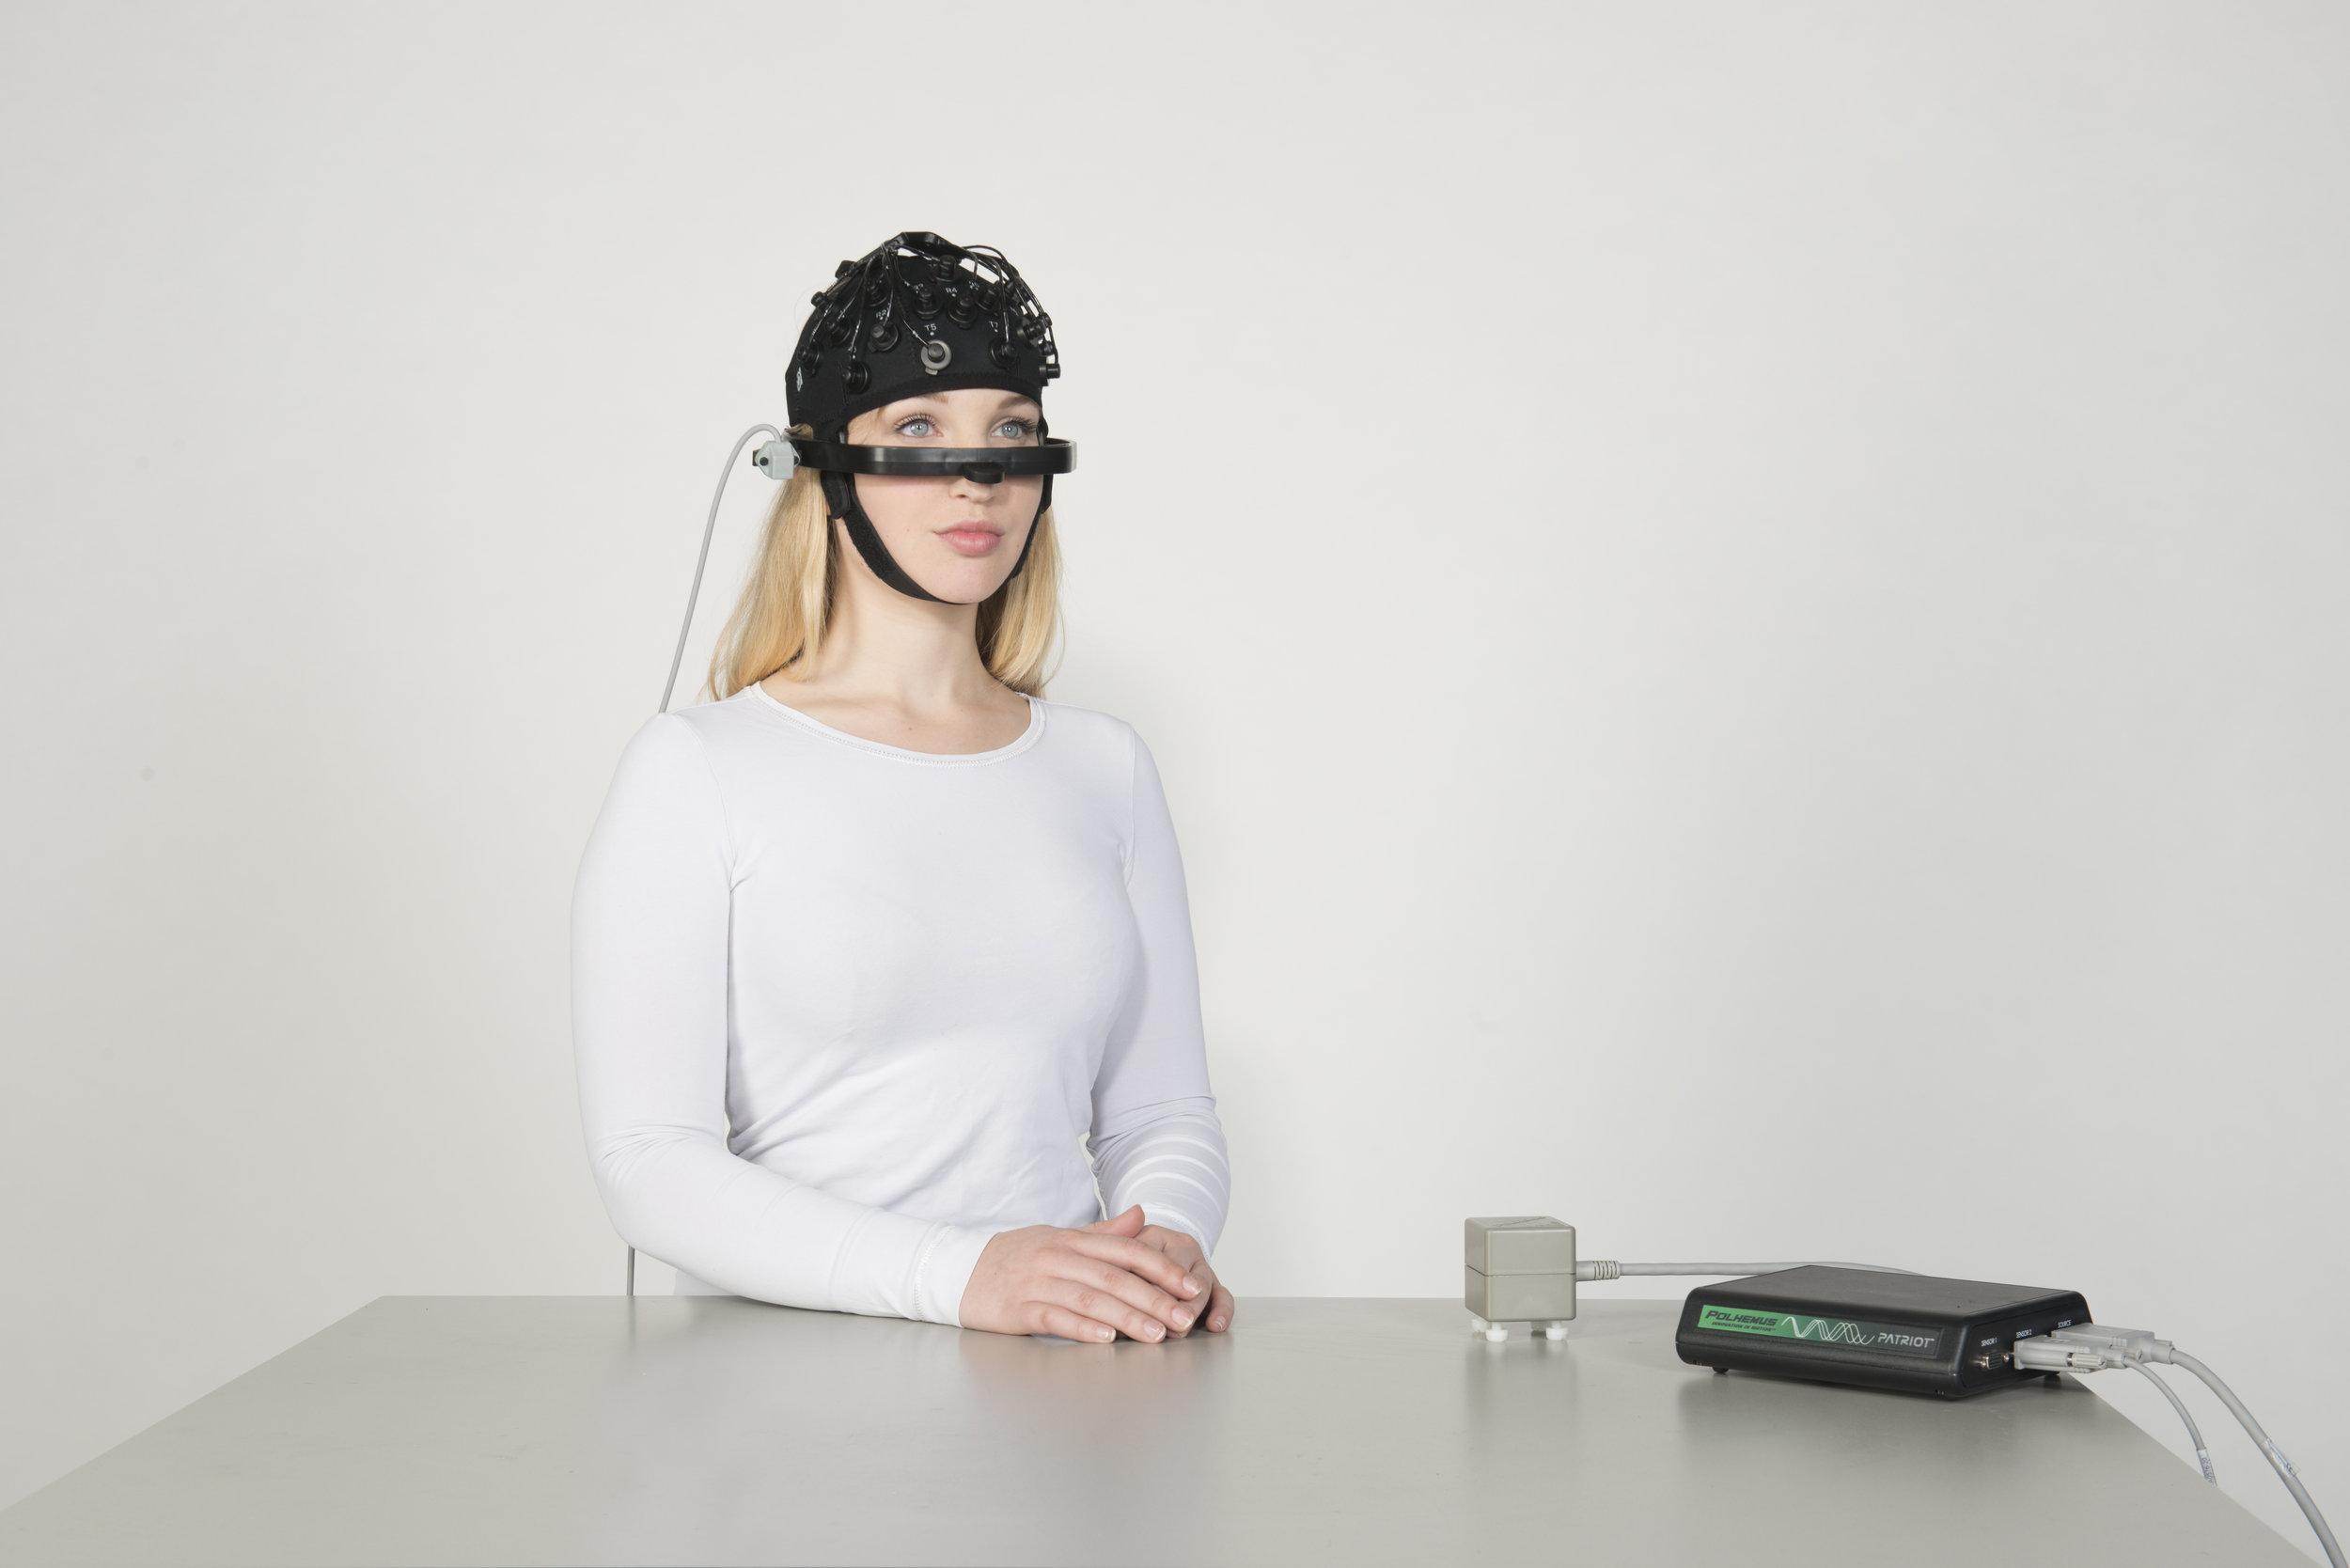 POLHEMUS - 3D digitizer for precise digitization of sensor positions